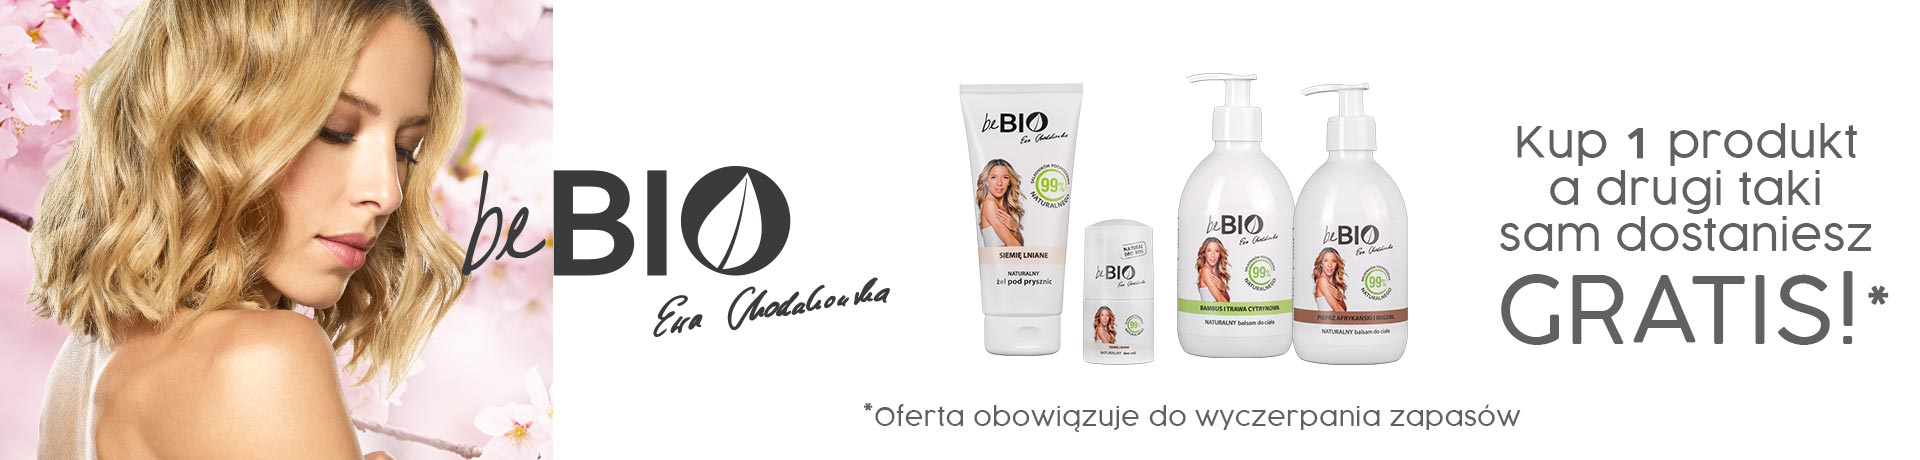 Bee.pl: kup jeden kosmetyk marki beBio, a drugi taki sam otrzymasz Gratis